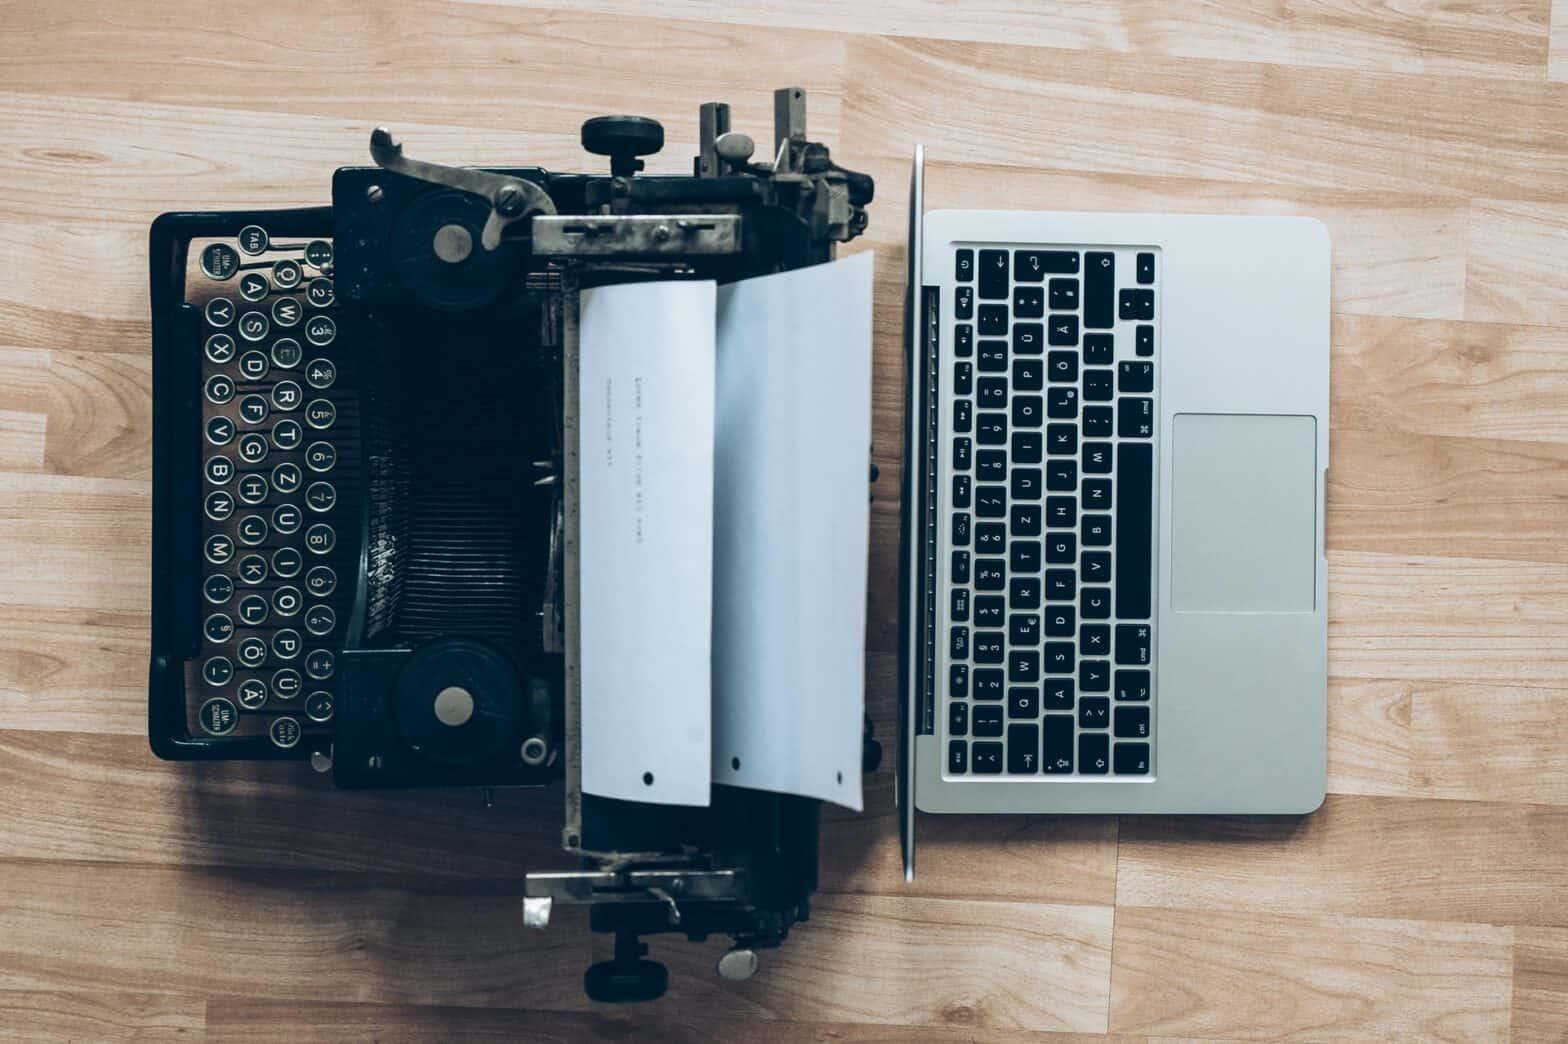 Book Editors for Hire